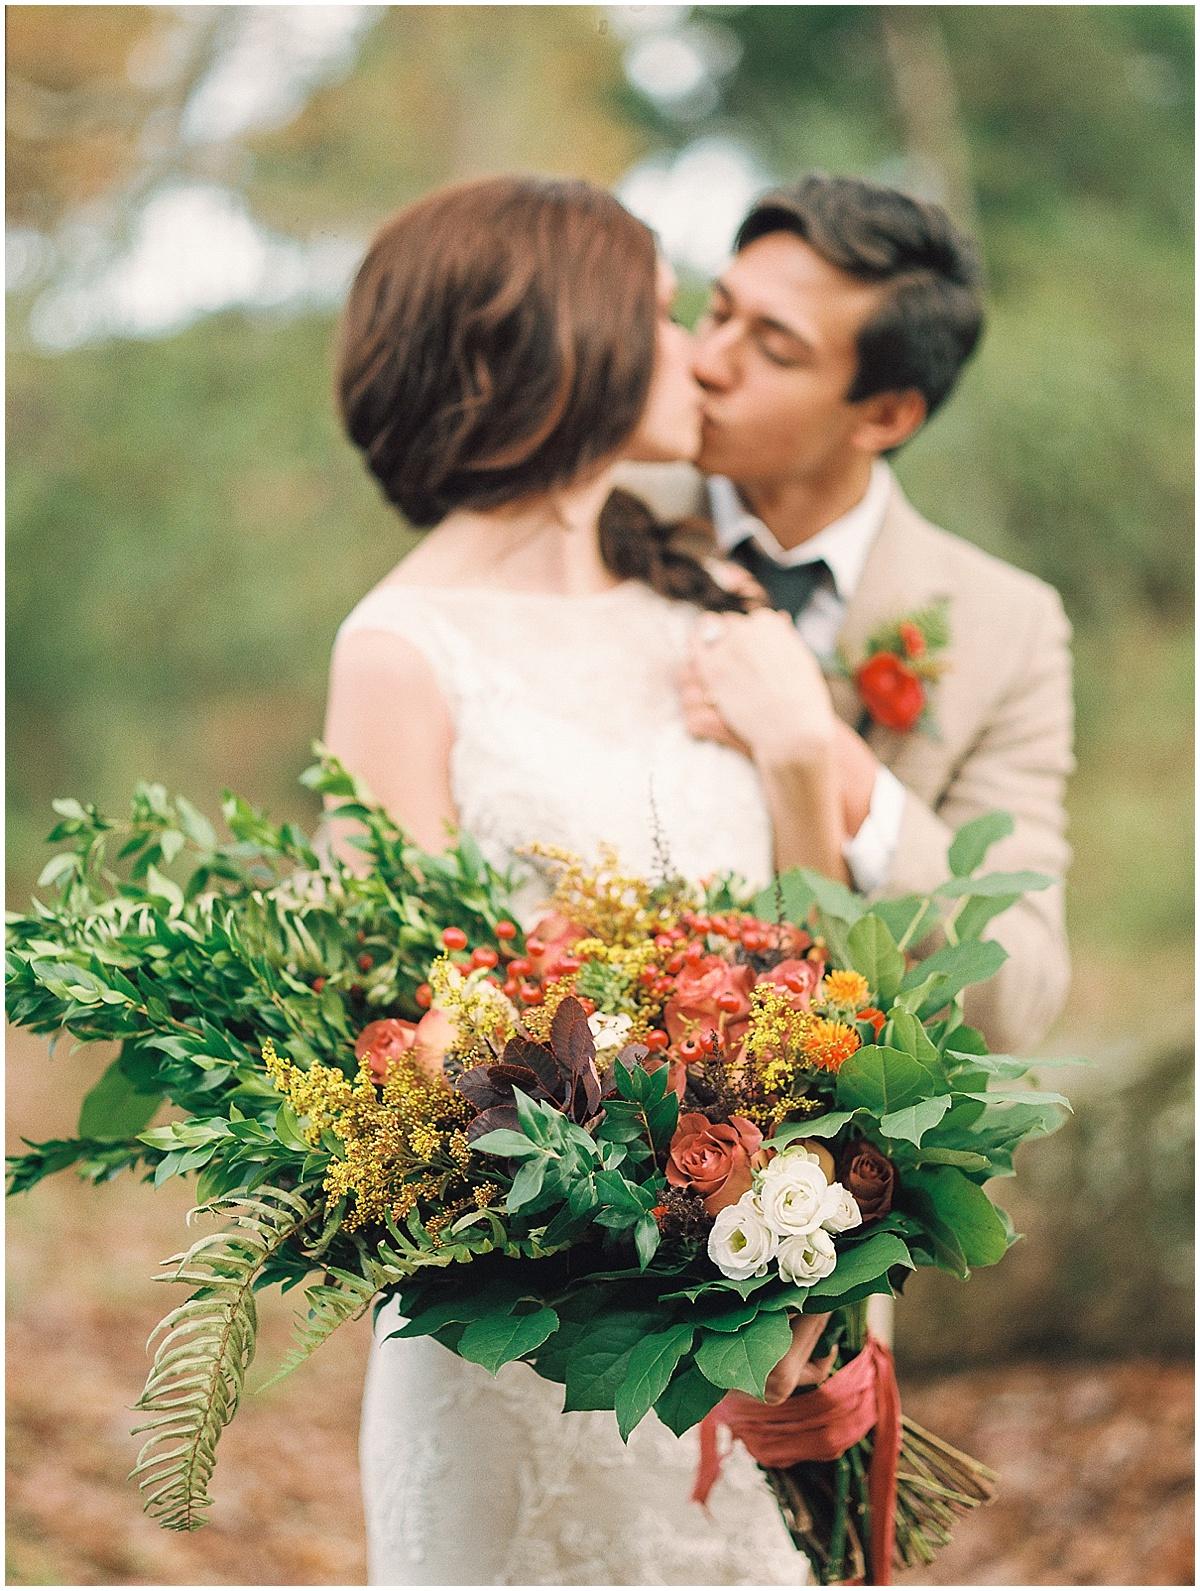 Abigail_Malone_Fall_Wedding_Knoxville_Film_Portra_400_Kodak_Mountain_Views_Abby_Elizabeth-28.jpg